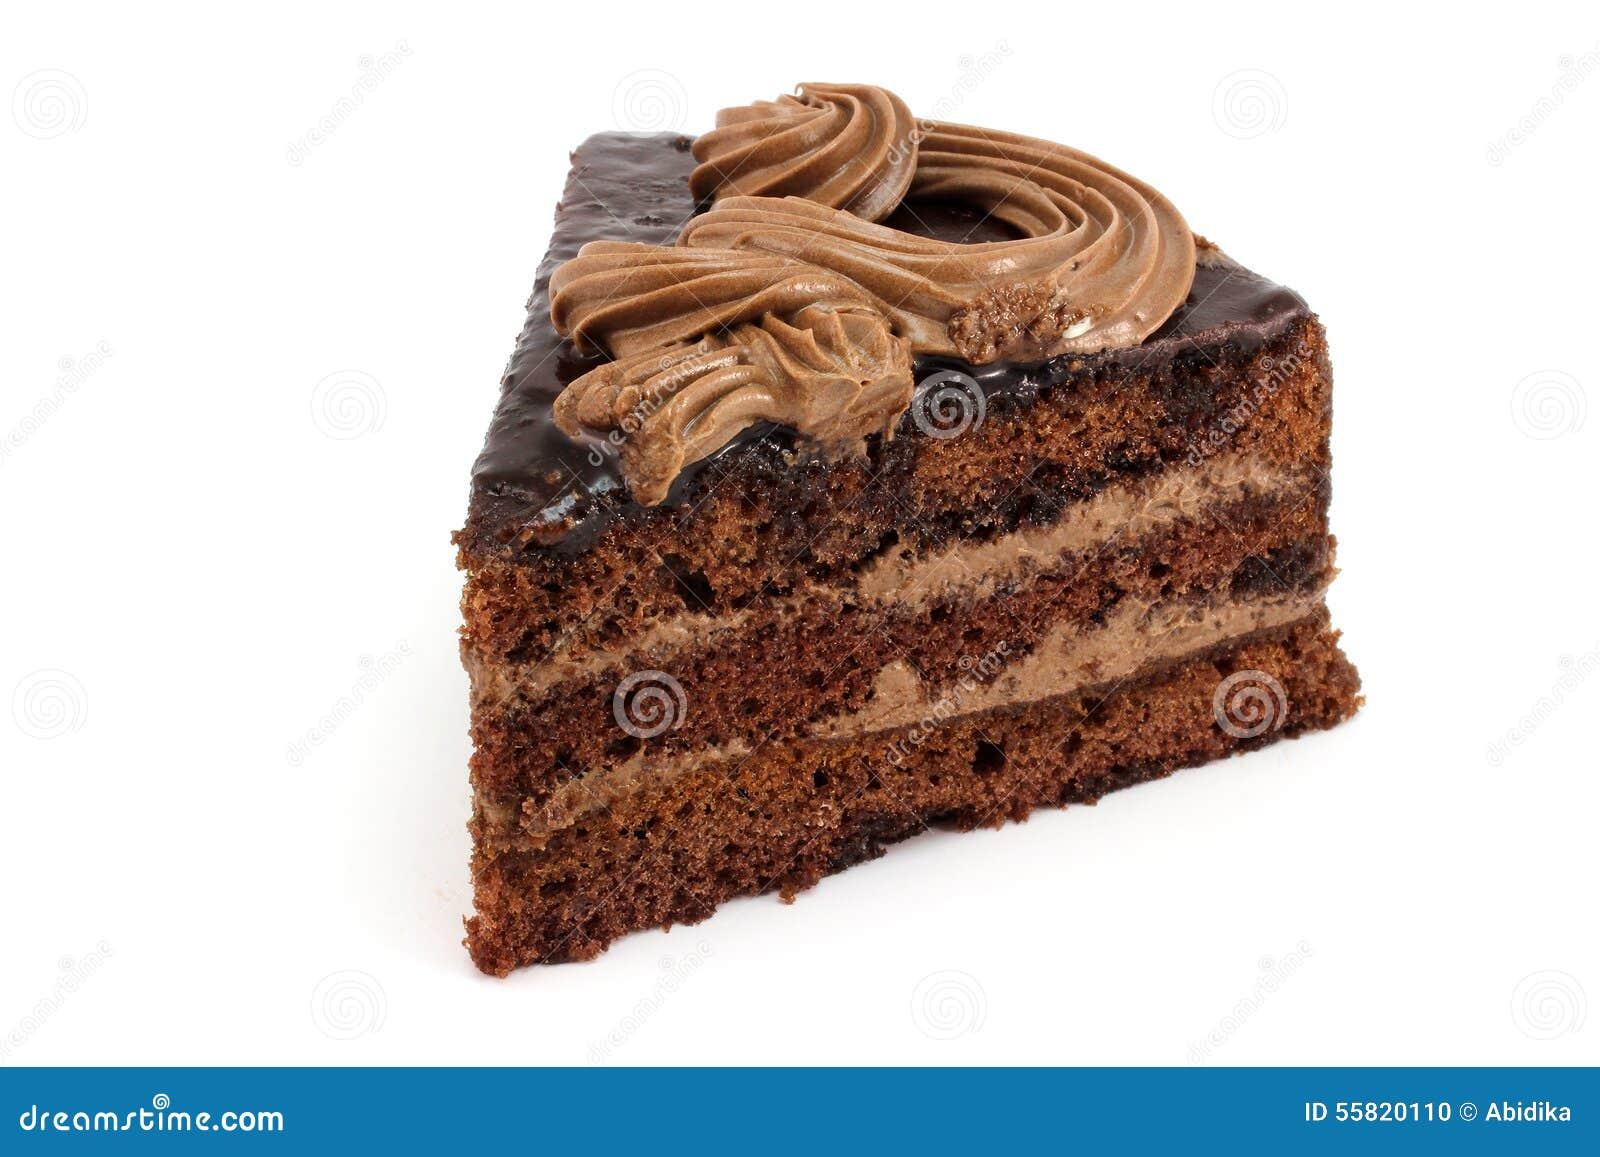 A Slice Of Cake Bakery